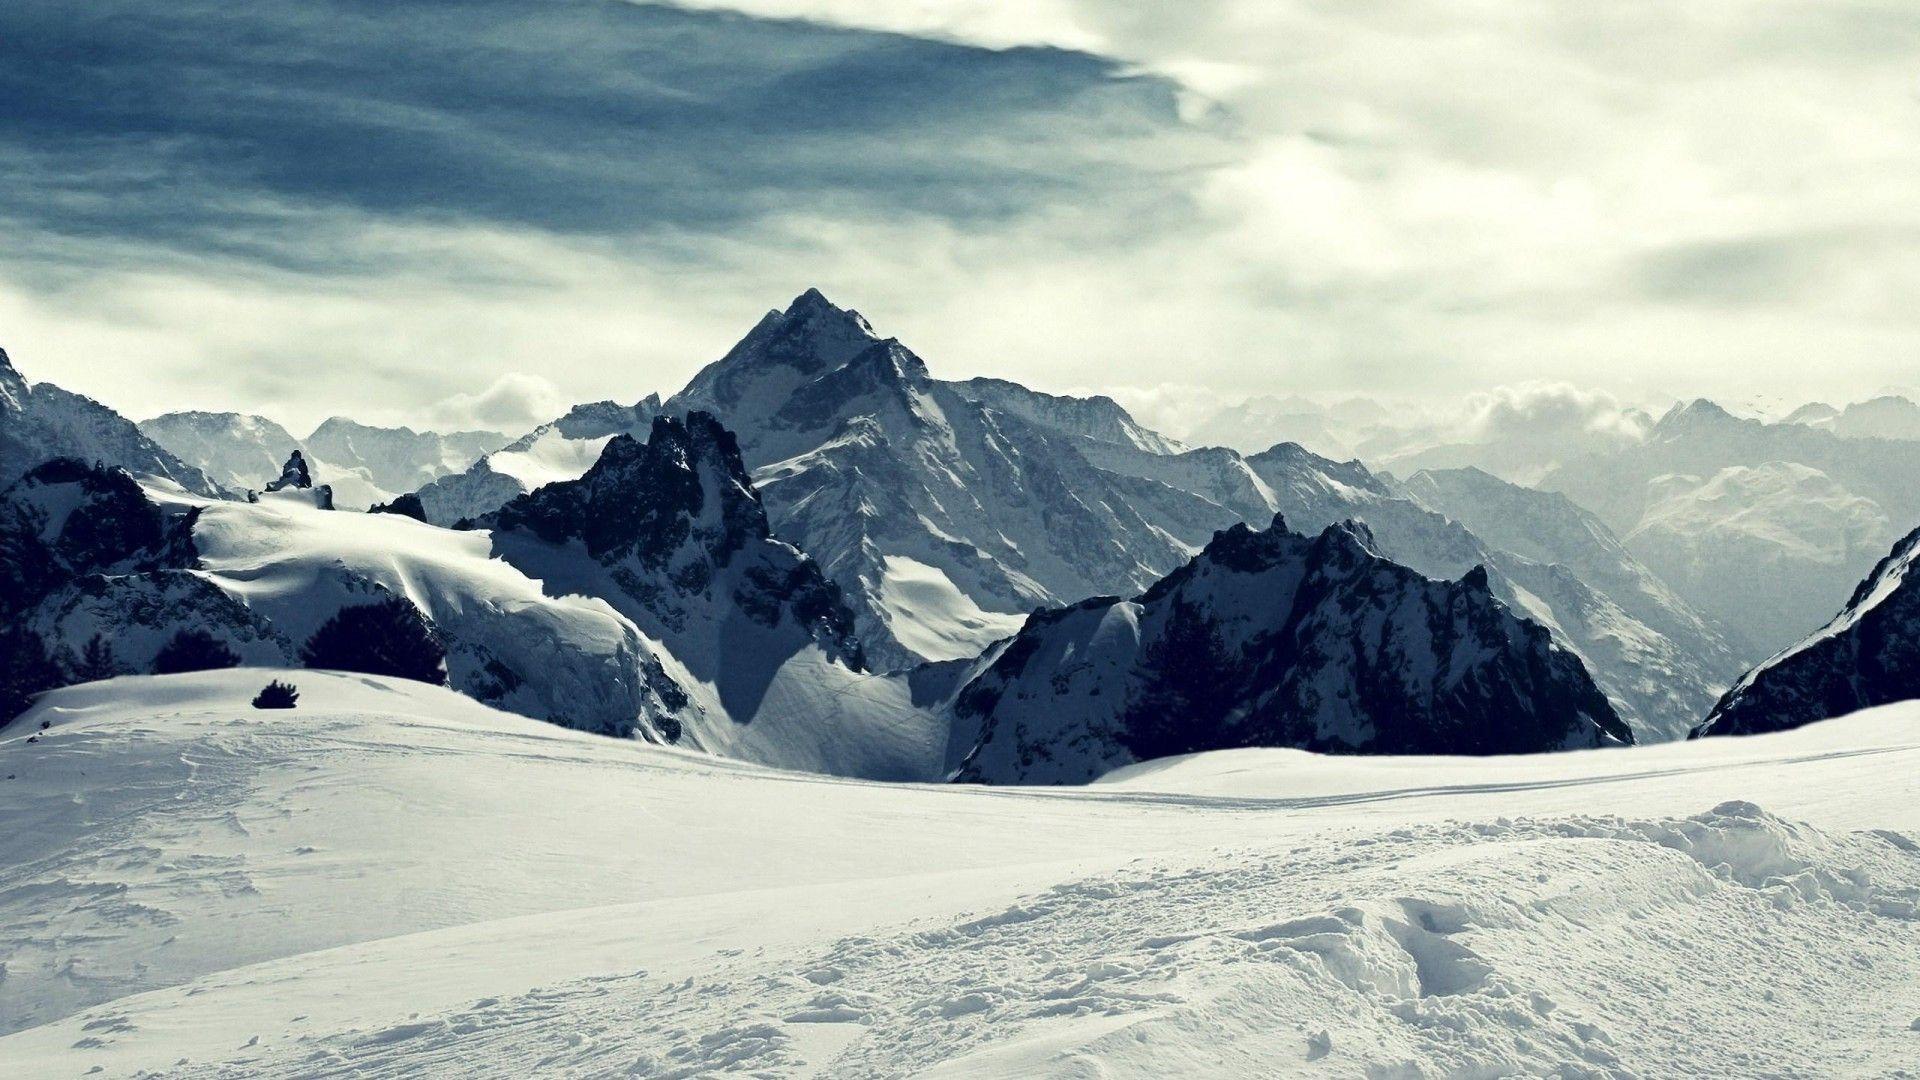 Snowy Wallpaper Picture hd